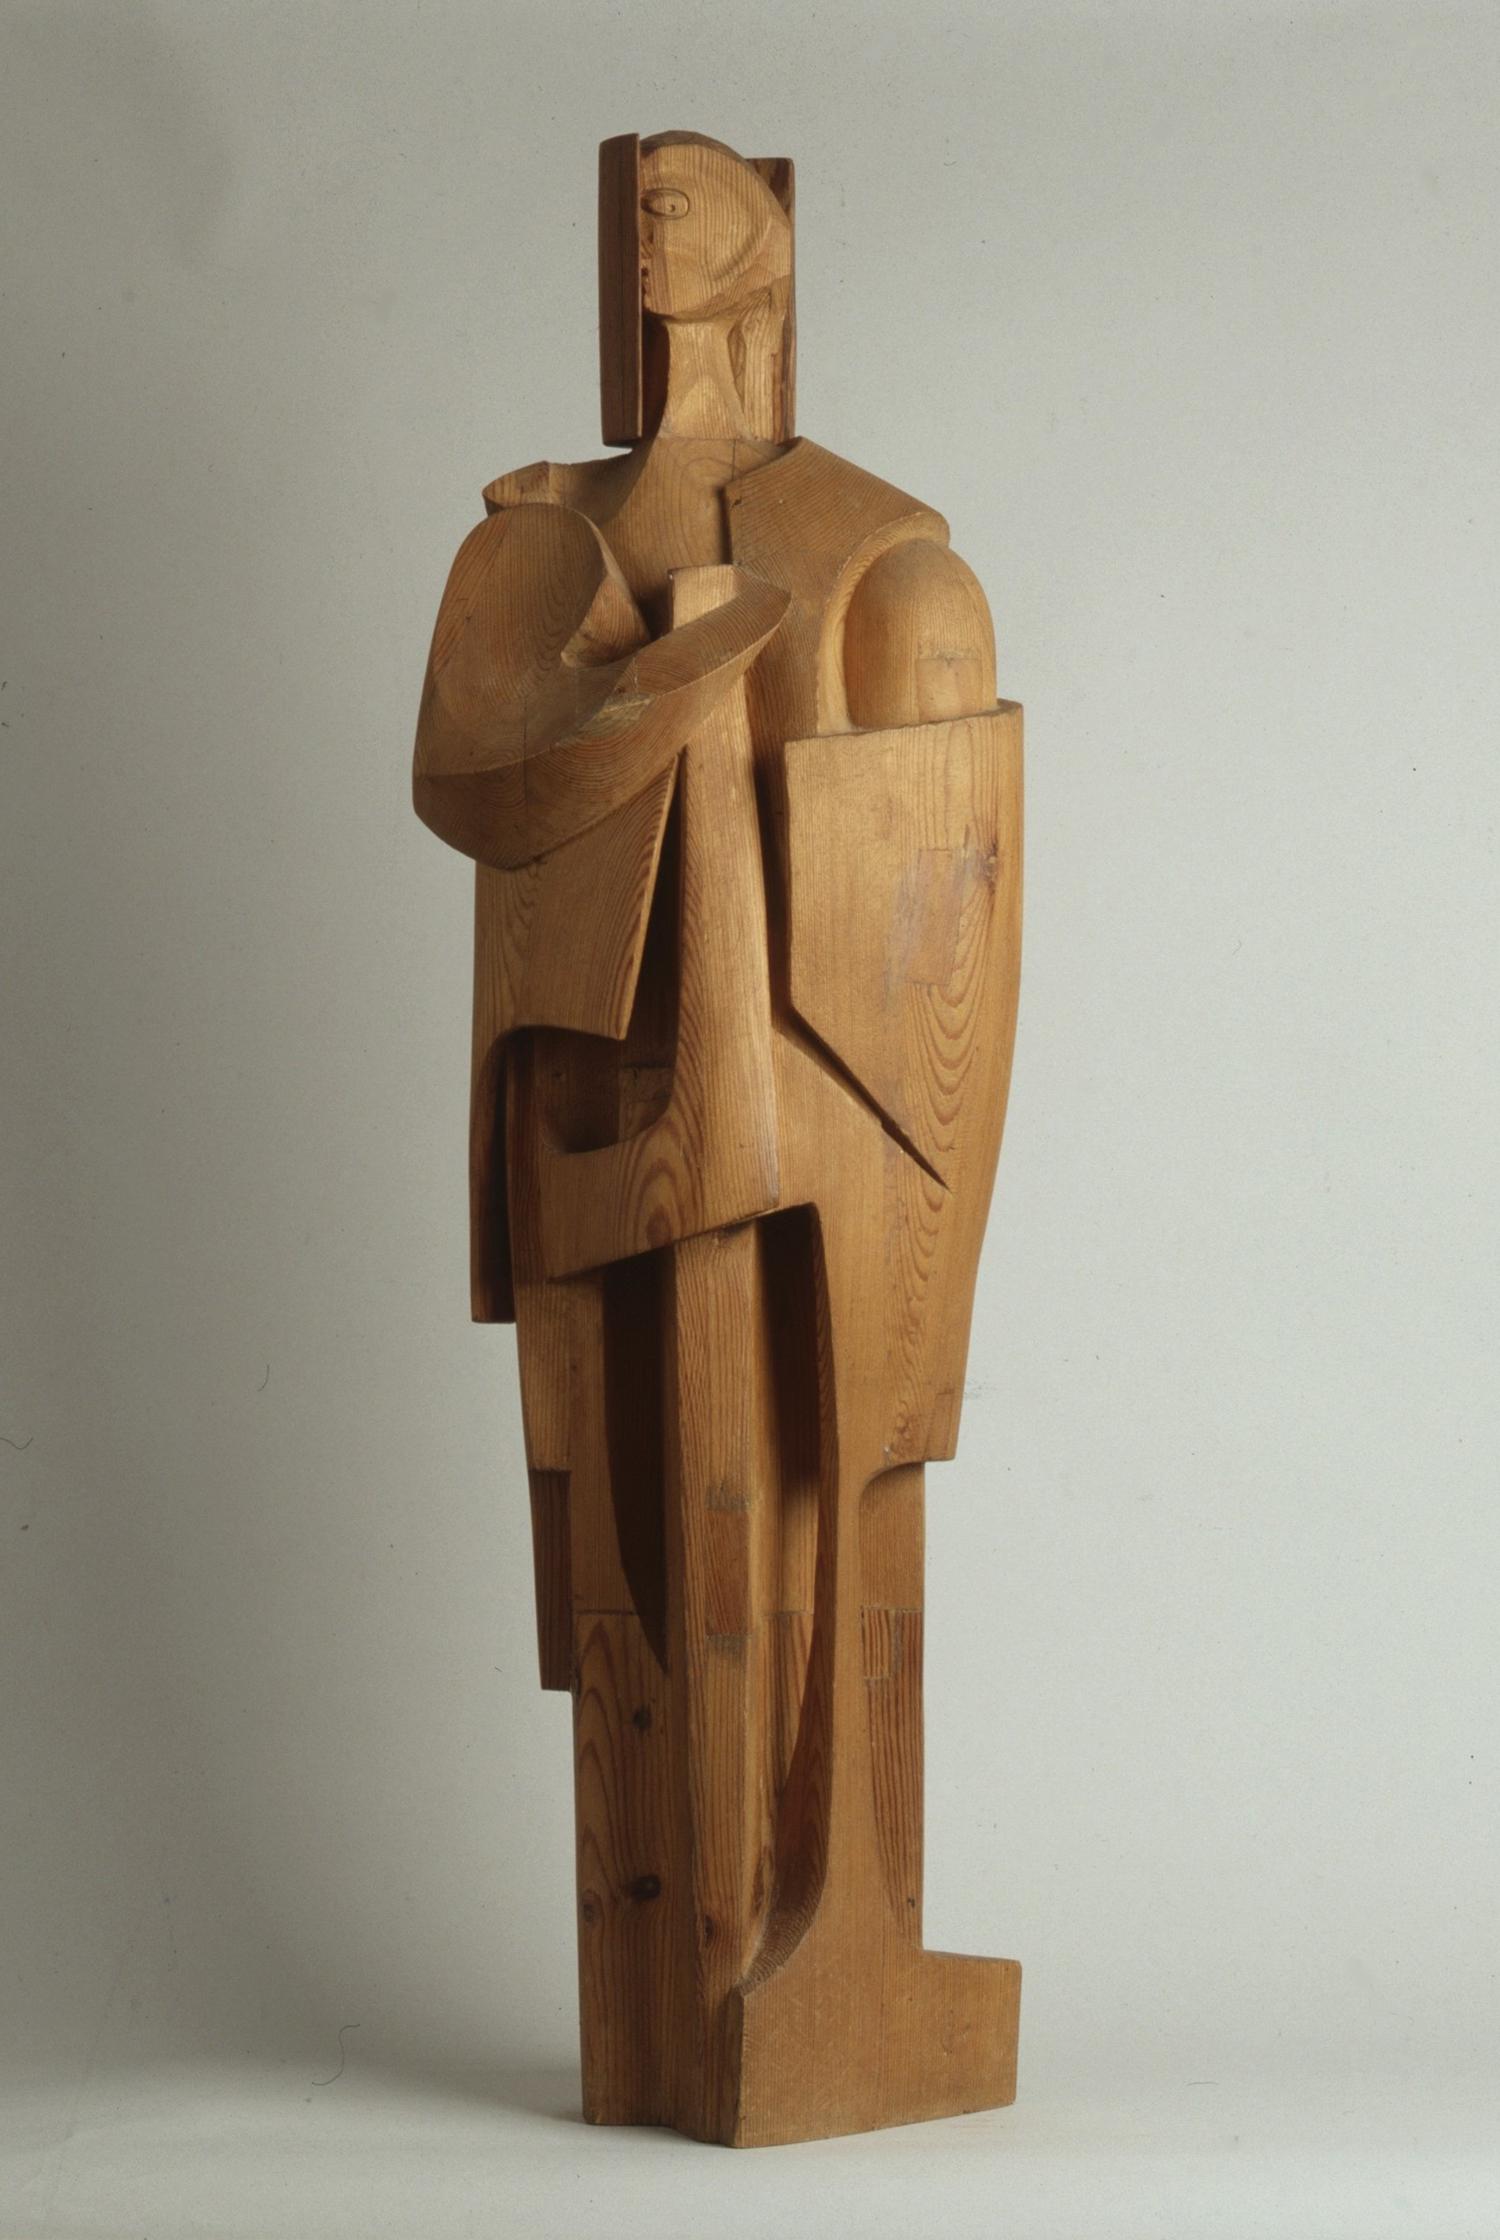 1967.4. Hombrarium, madera, talla directa, 106x33x23 cms. 1967